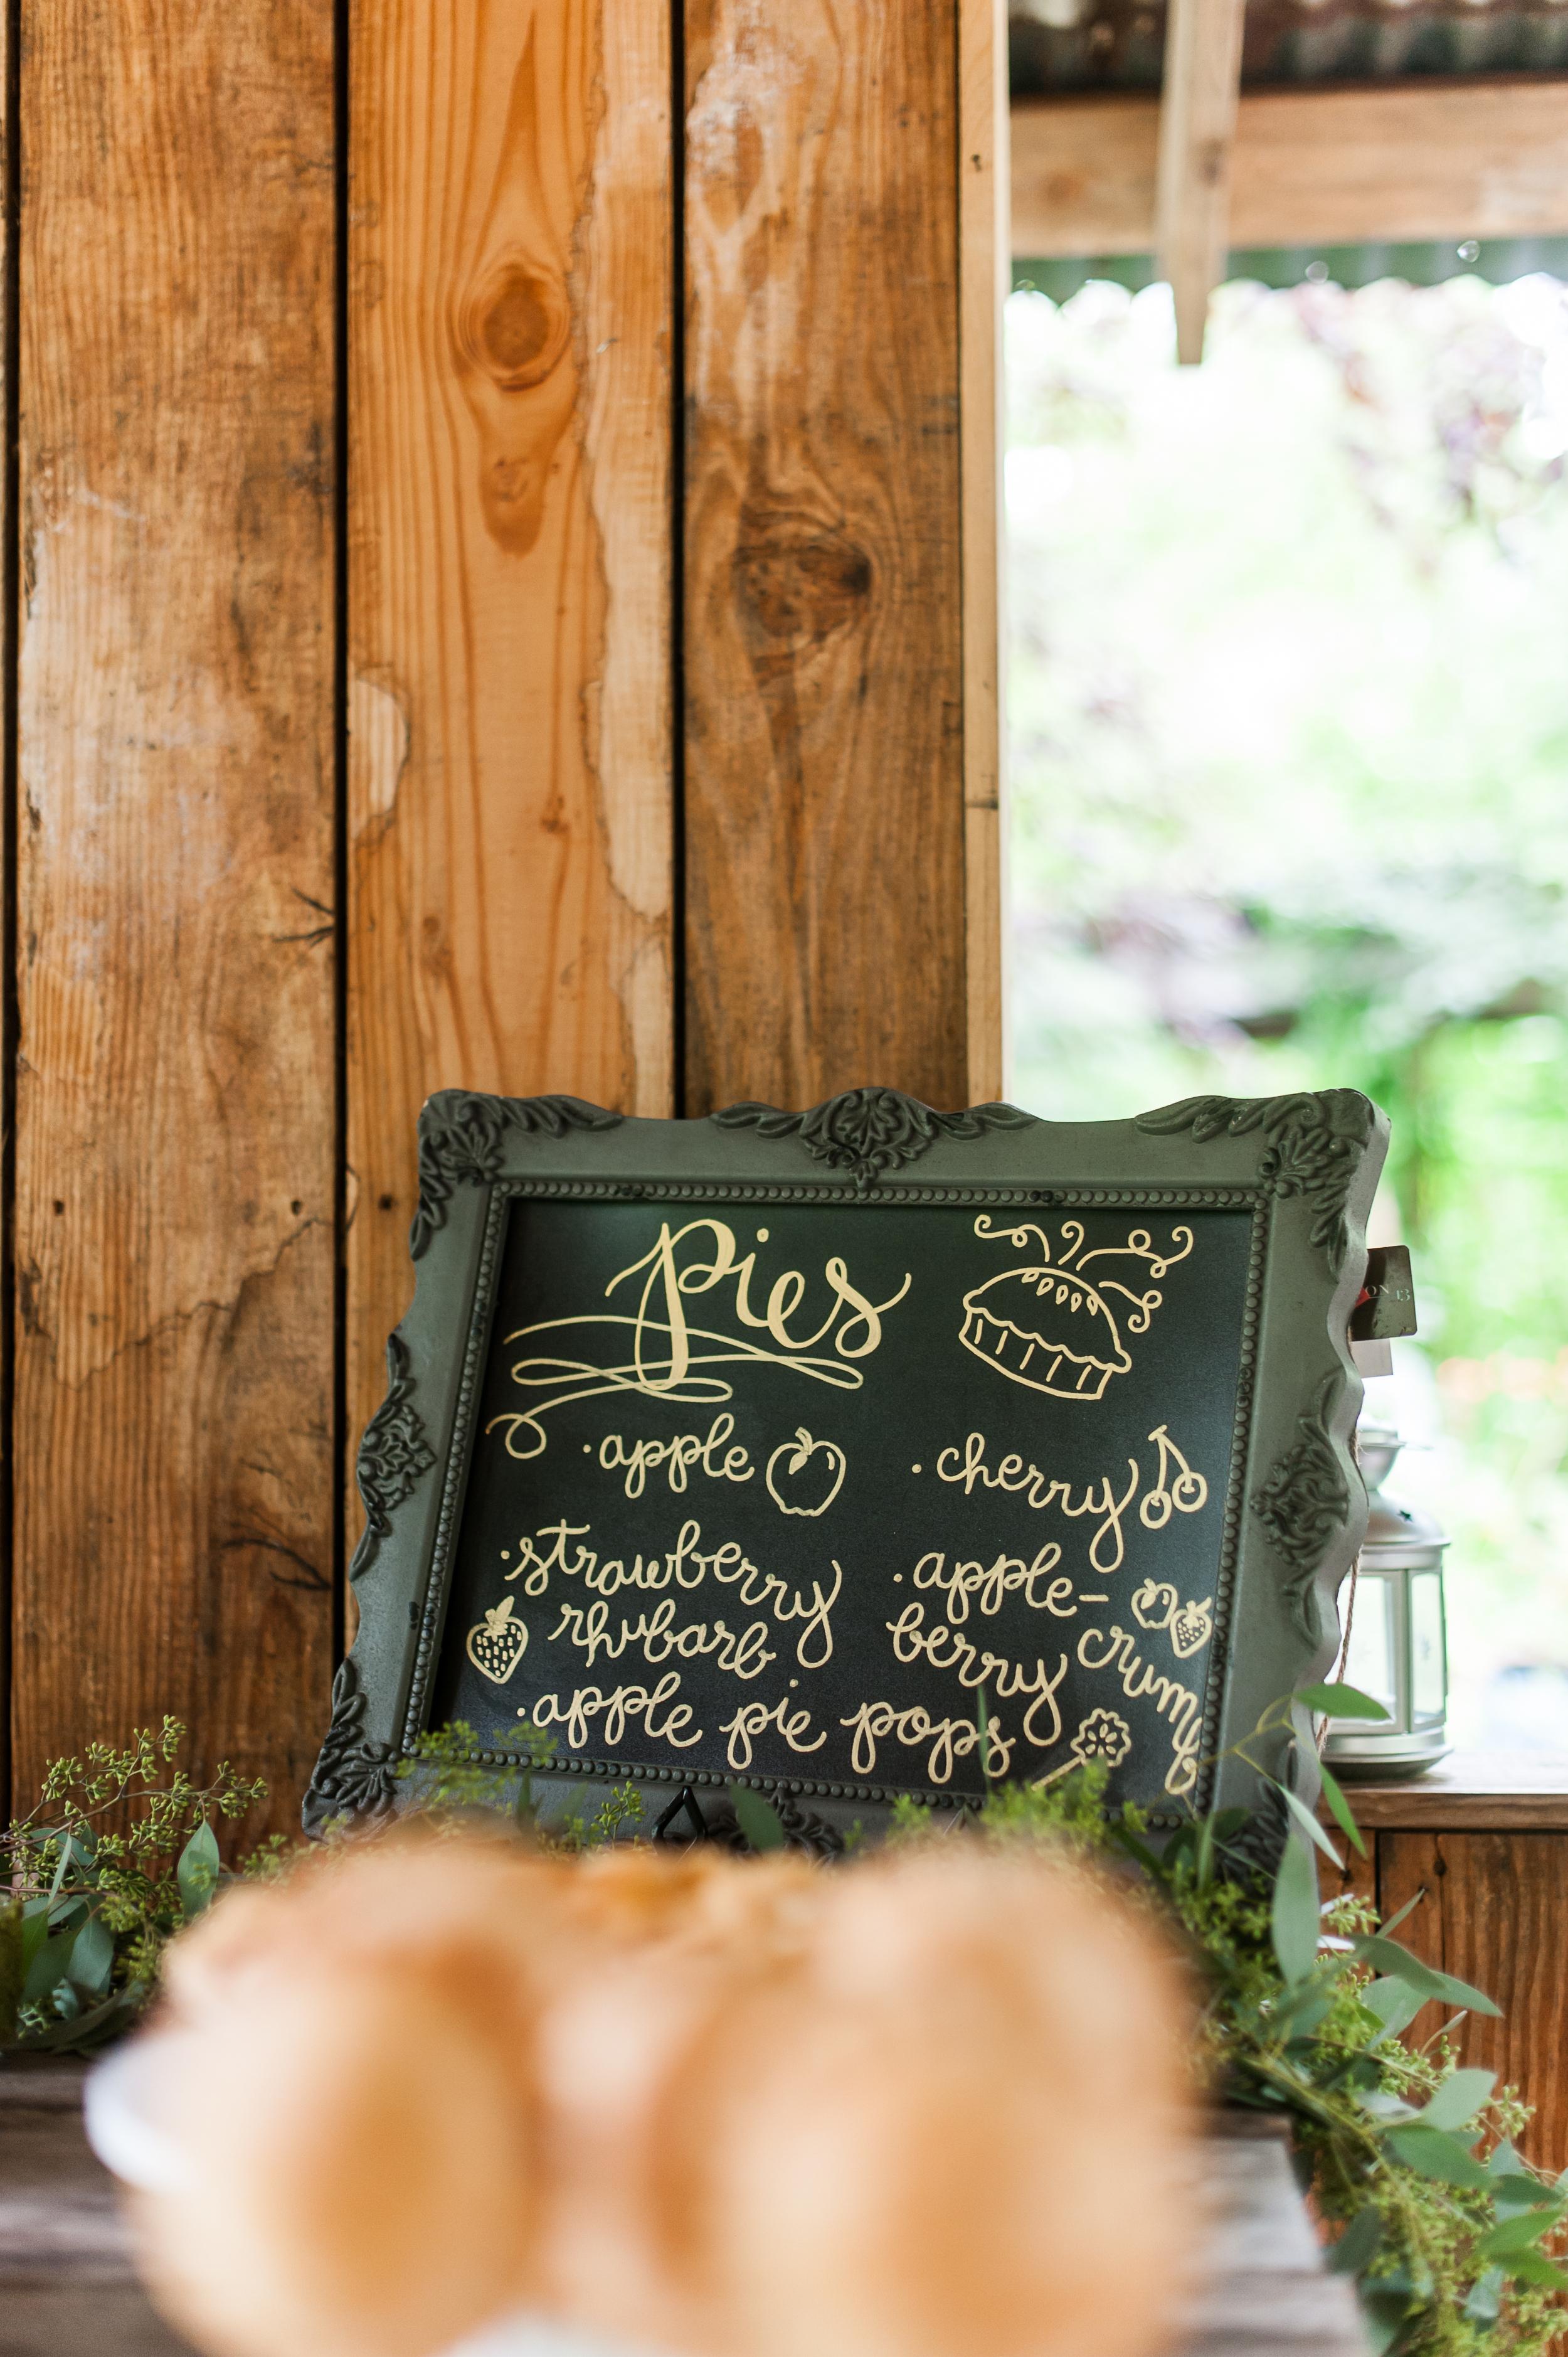 JJ-wedding-Van-Wyhe-Photography-249.jpg